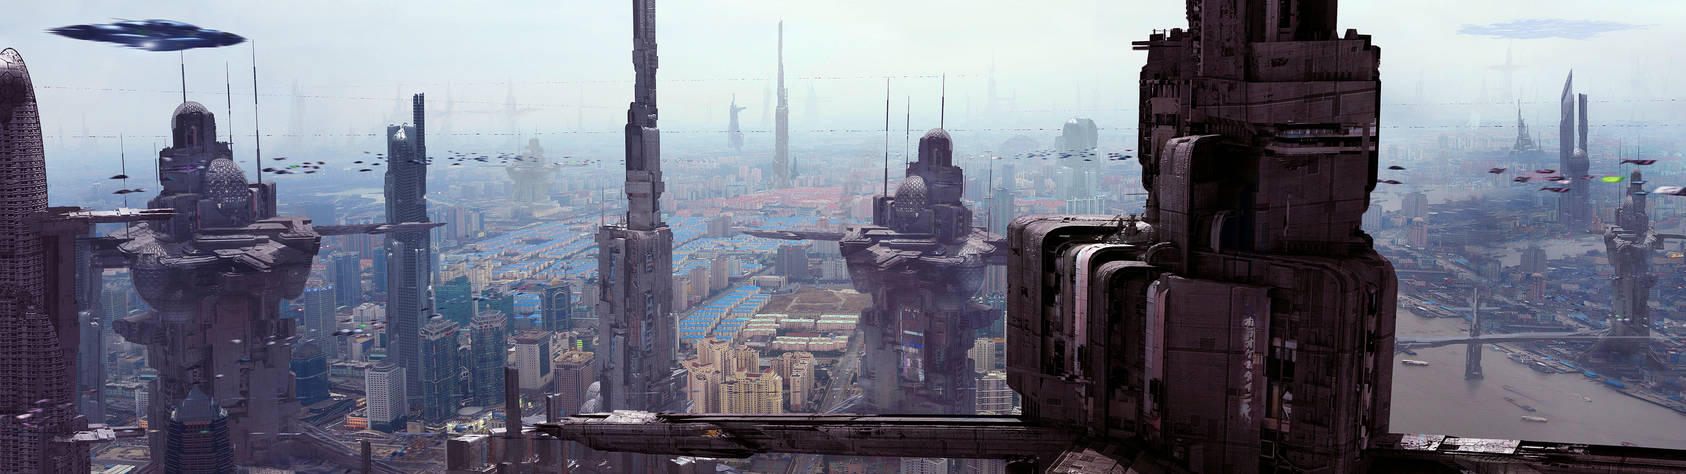 Futuristic City 6 by Scott Richard Dual Screen